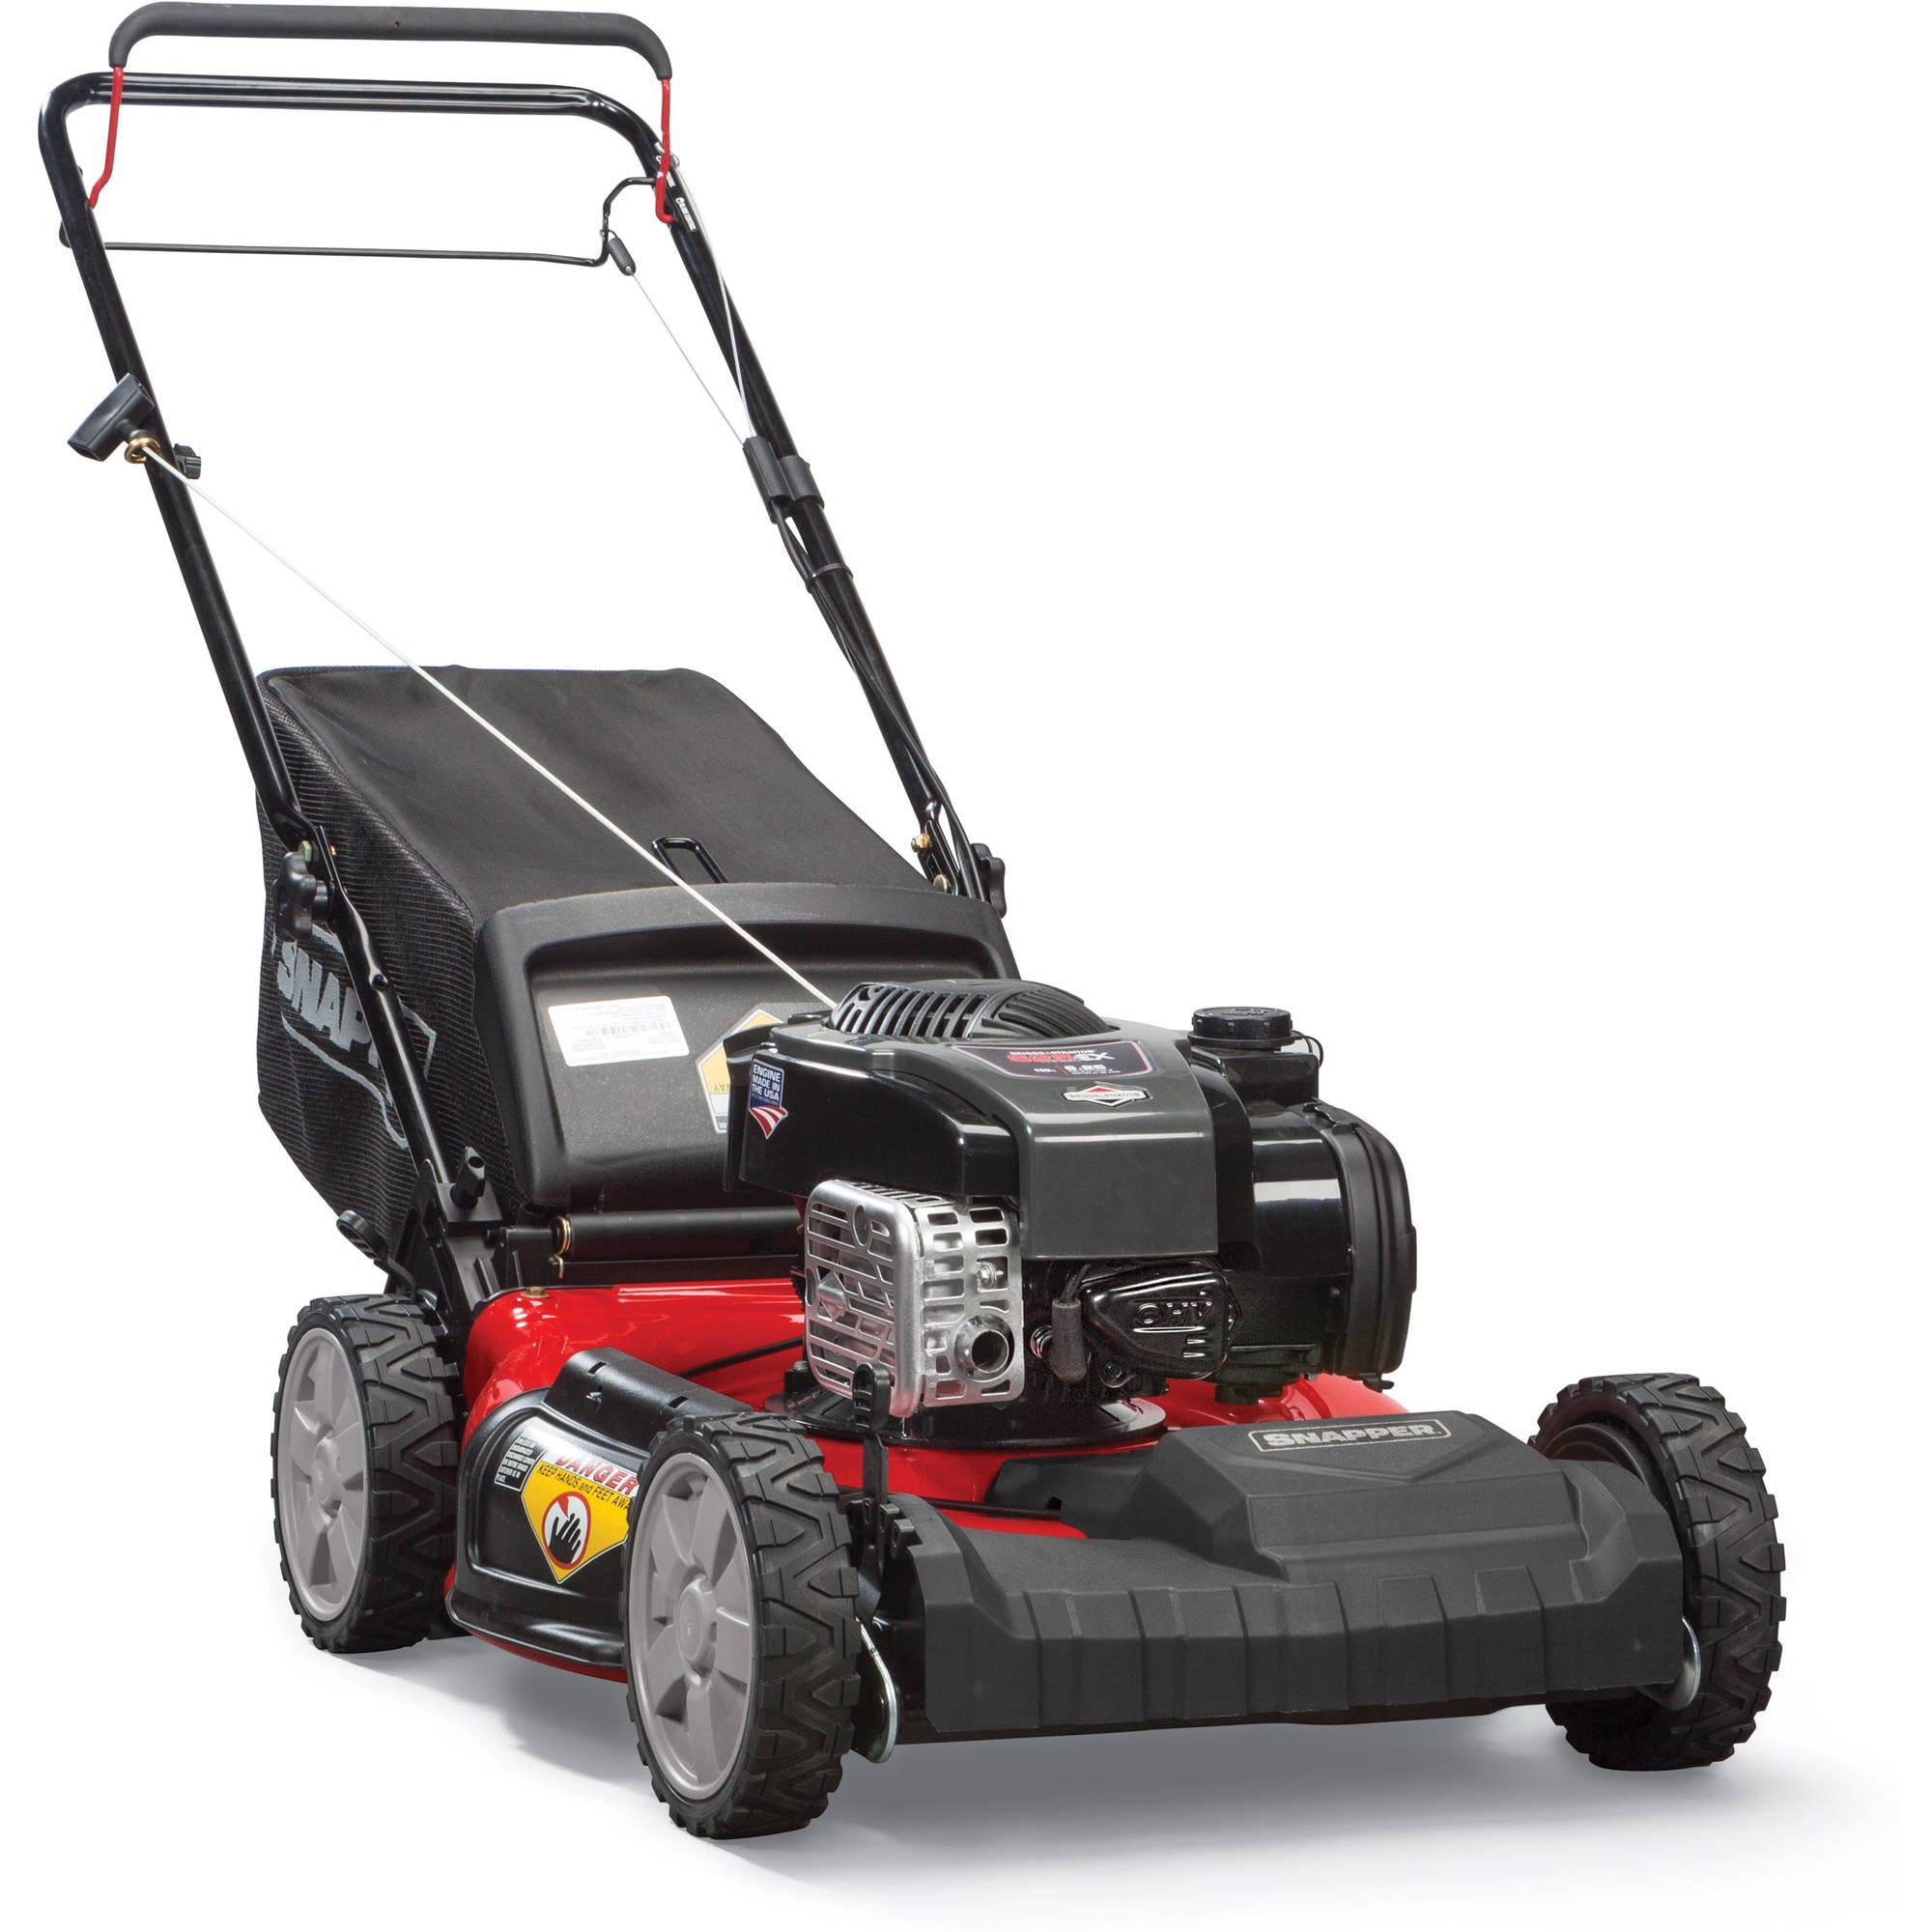 Snapper Lawn Mower Parts Diagram